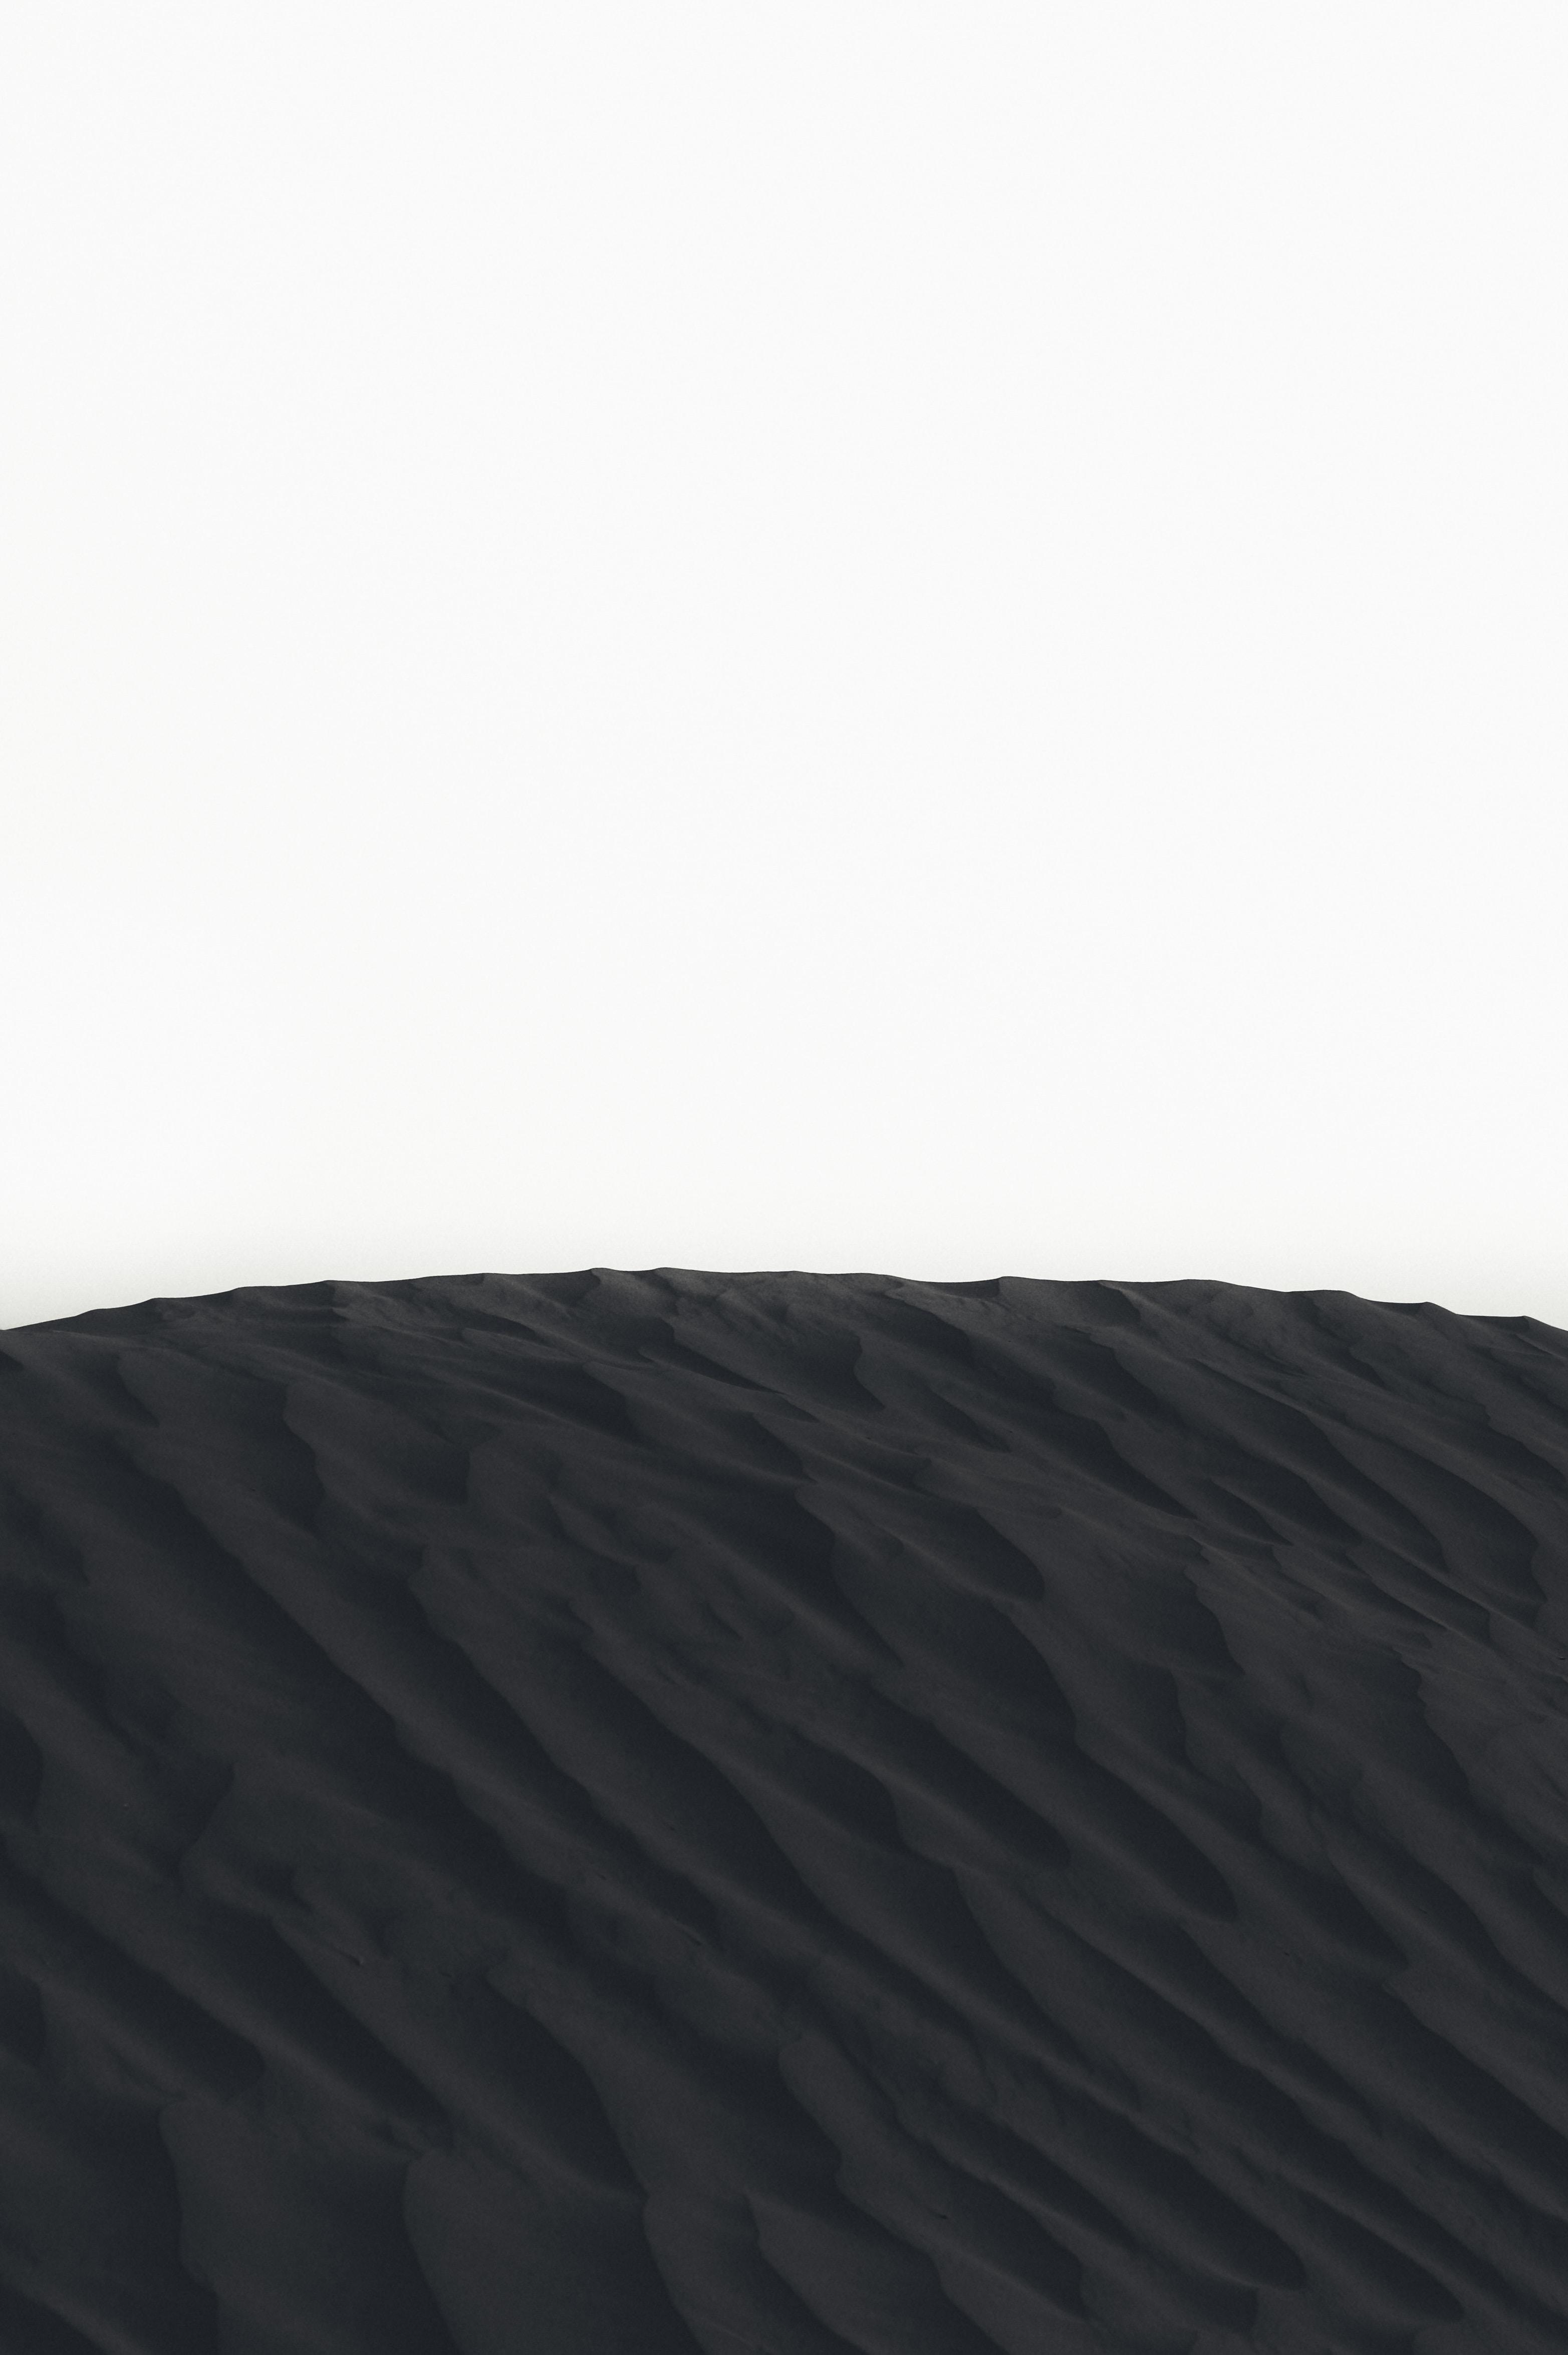 landscape photography of sand dunes